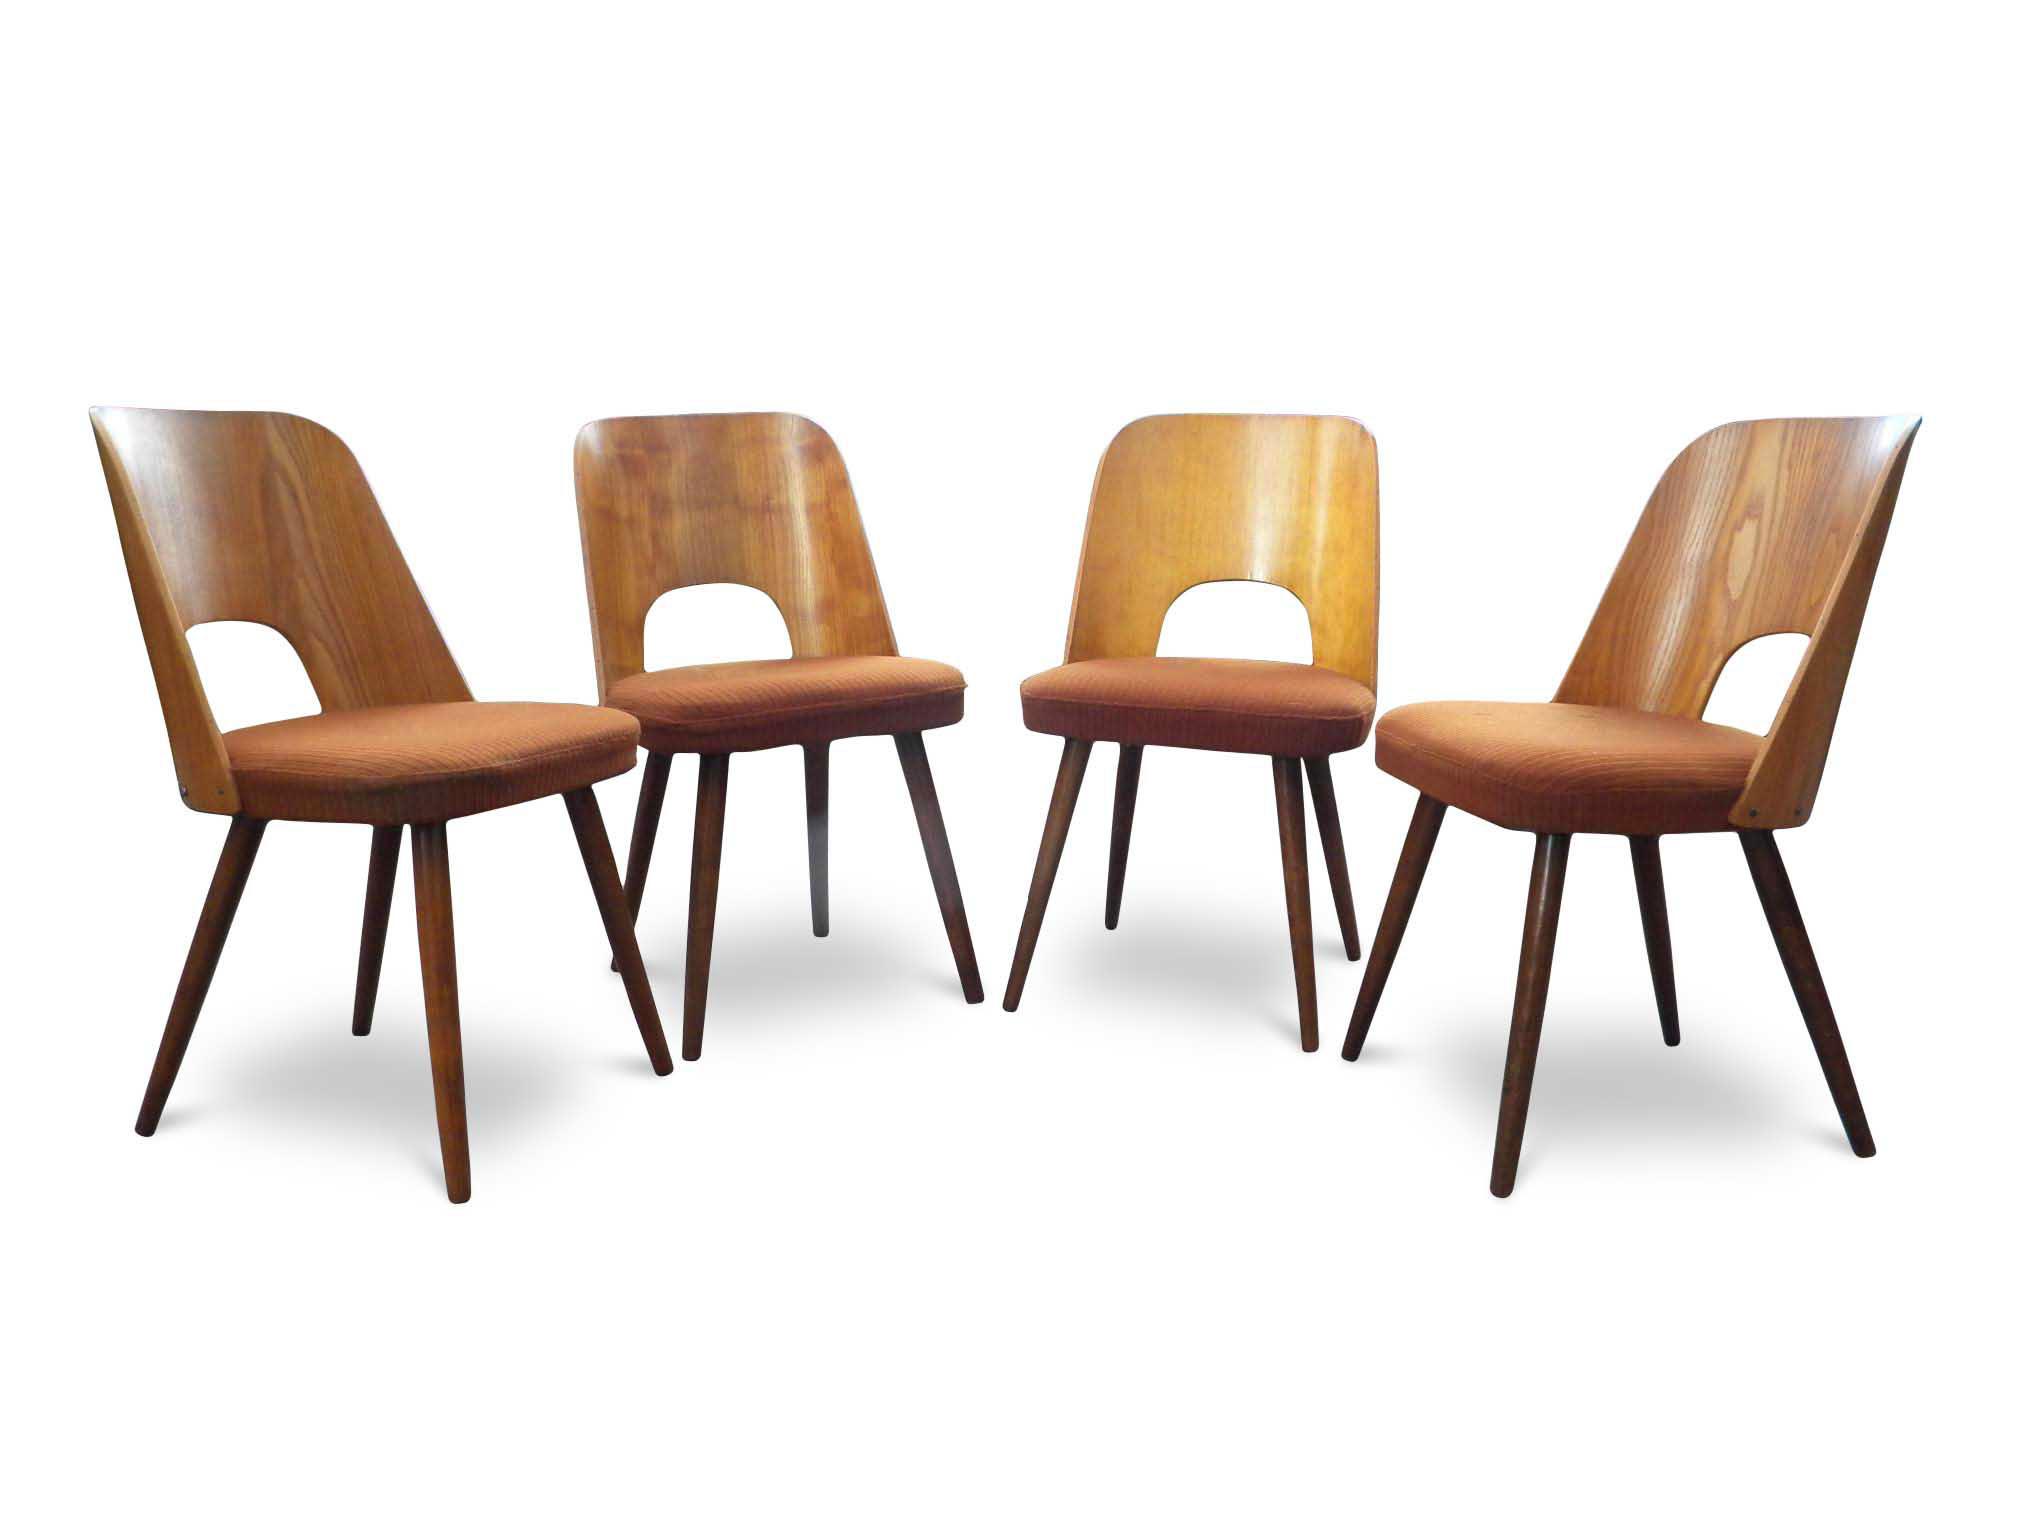 Sedie vintage anni 50 modernariato italian vintage sofa for Sedia design anni 40